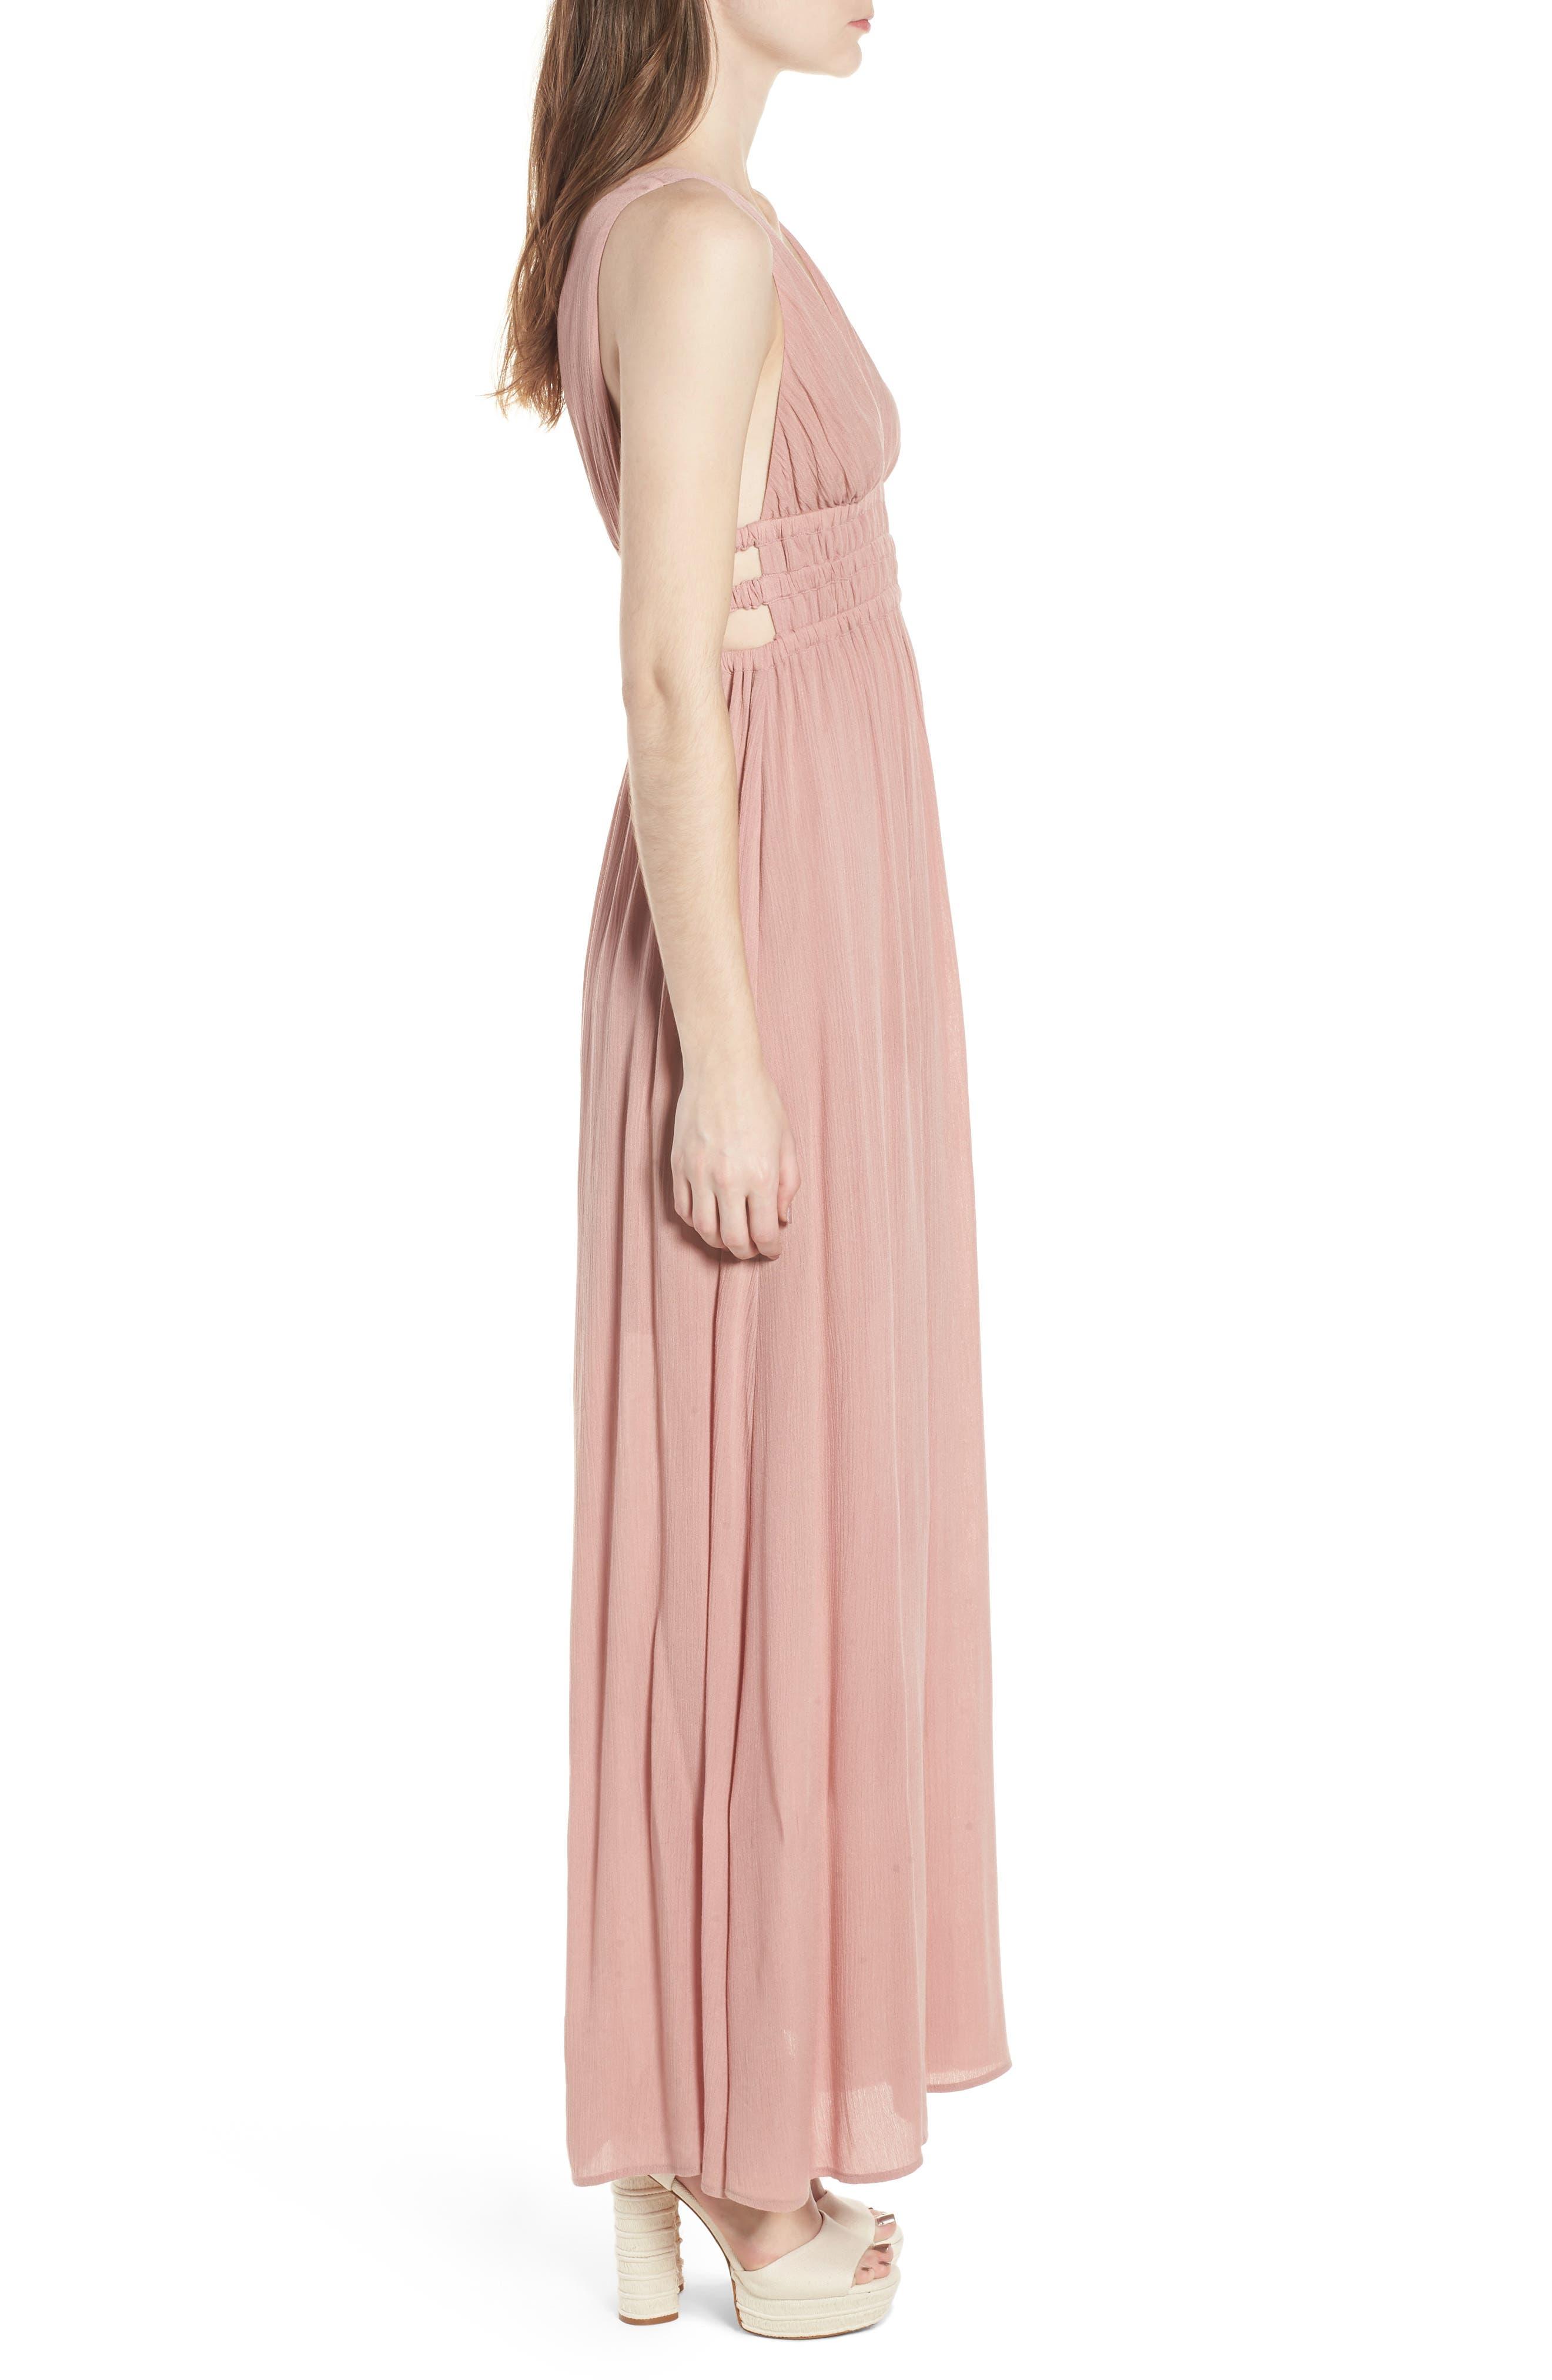 Surrey Maxi Dress,                             Alternate thumbnail 6, color,                             Nude Rose